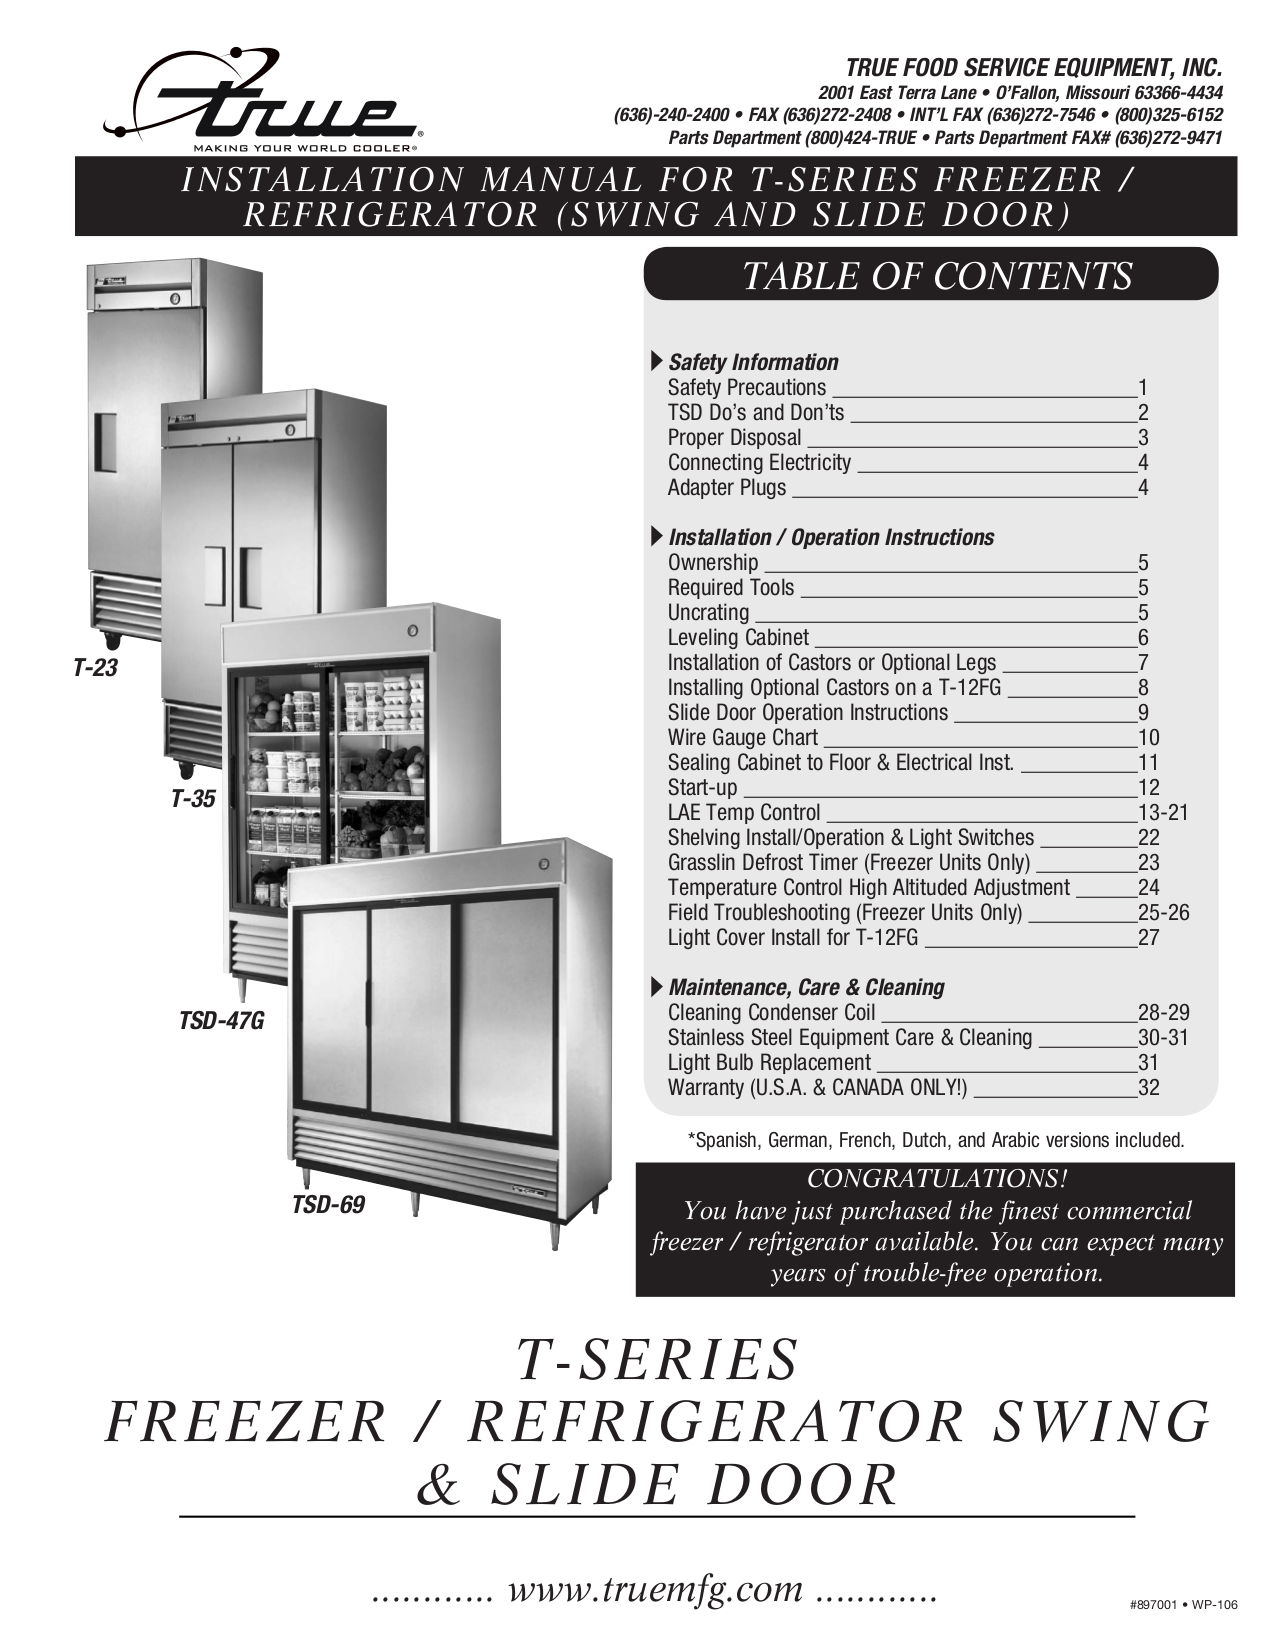 TrueTSeries.pdf 0 download free pdf for true t 12f freezer manual true t 23f wiring diagram at crackthecode.co